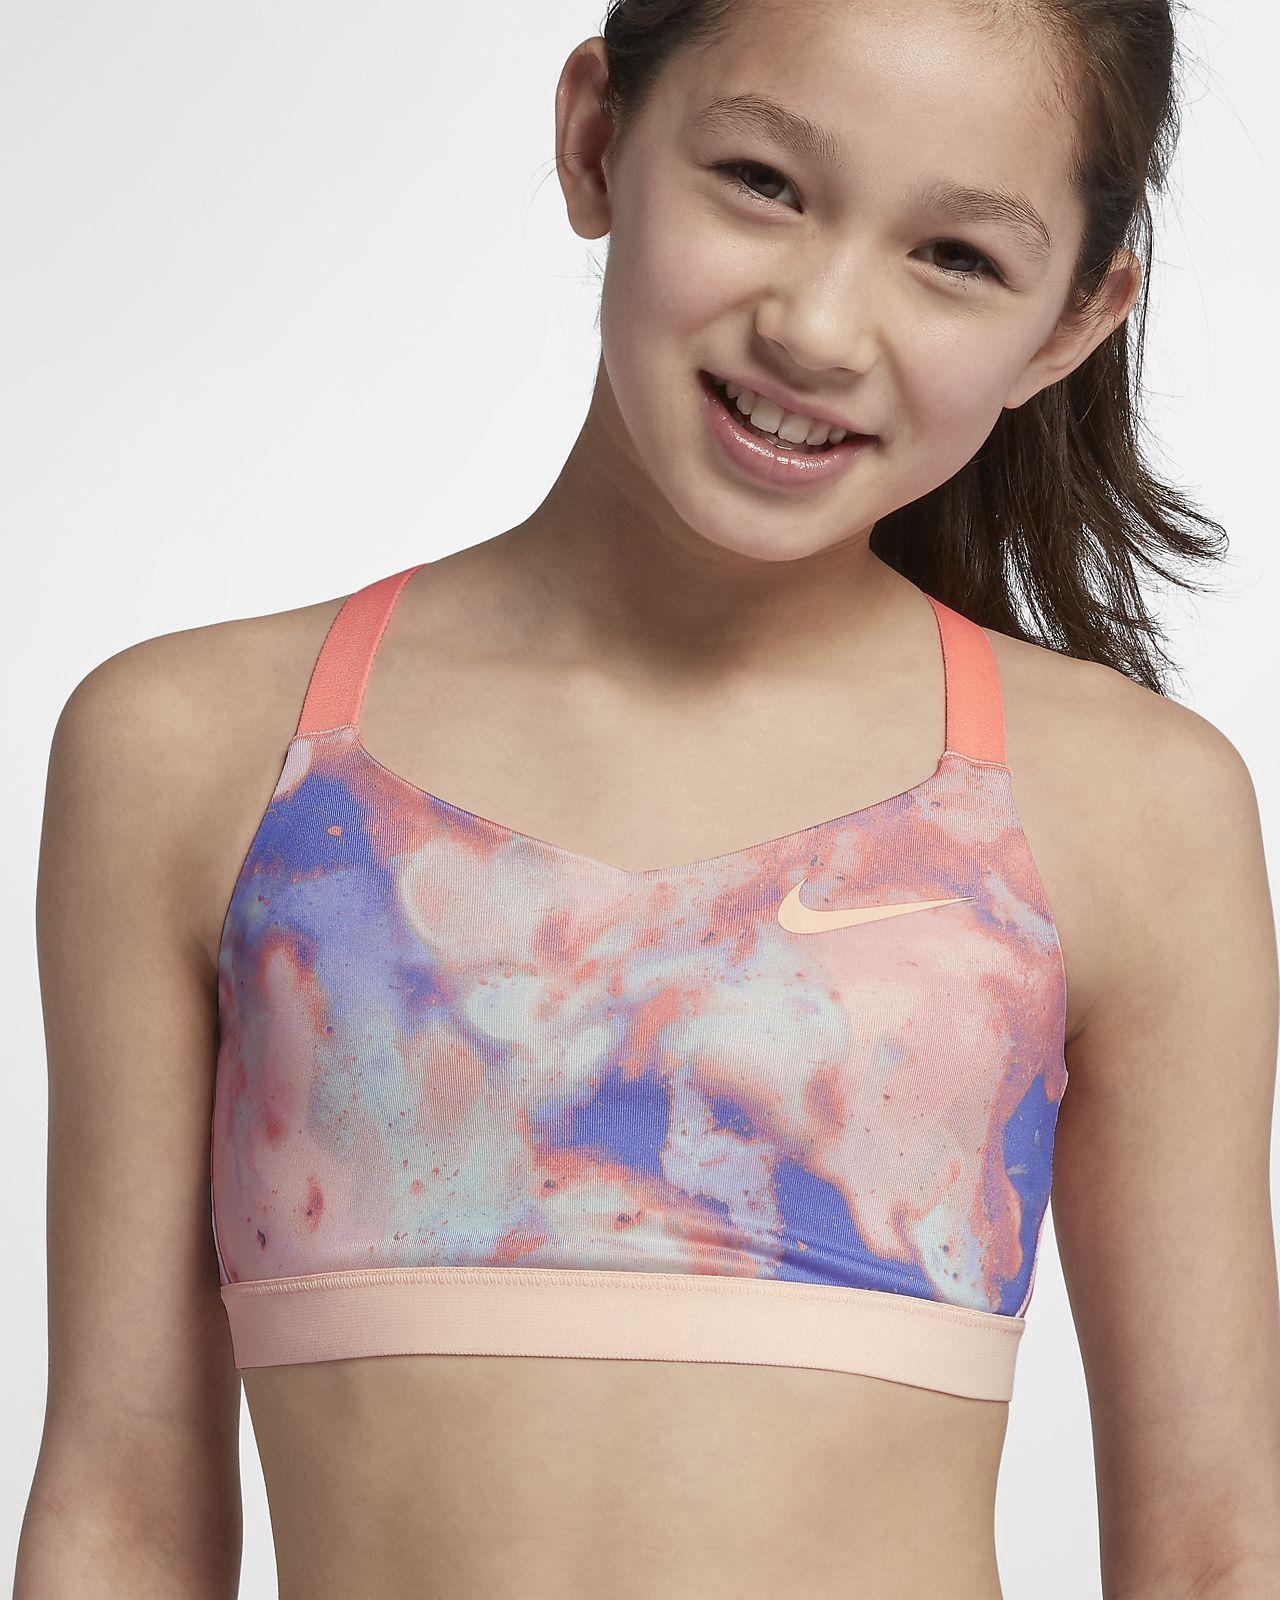 743ed28c3 Nike Favorites Big Kids  (Girls ) Sports Bra - M (10-12) Crimson ...